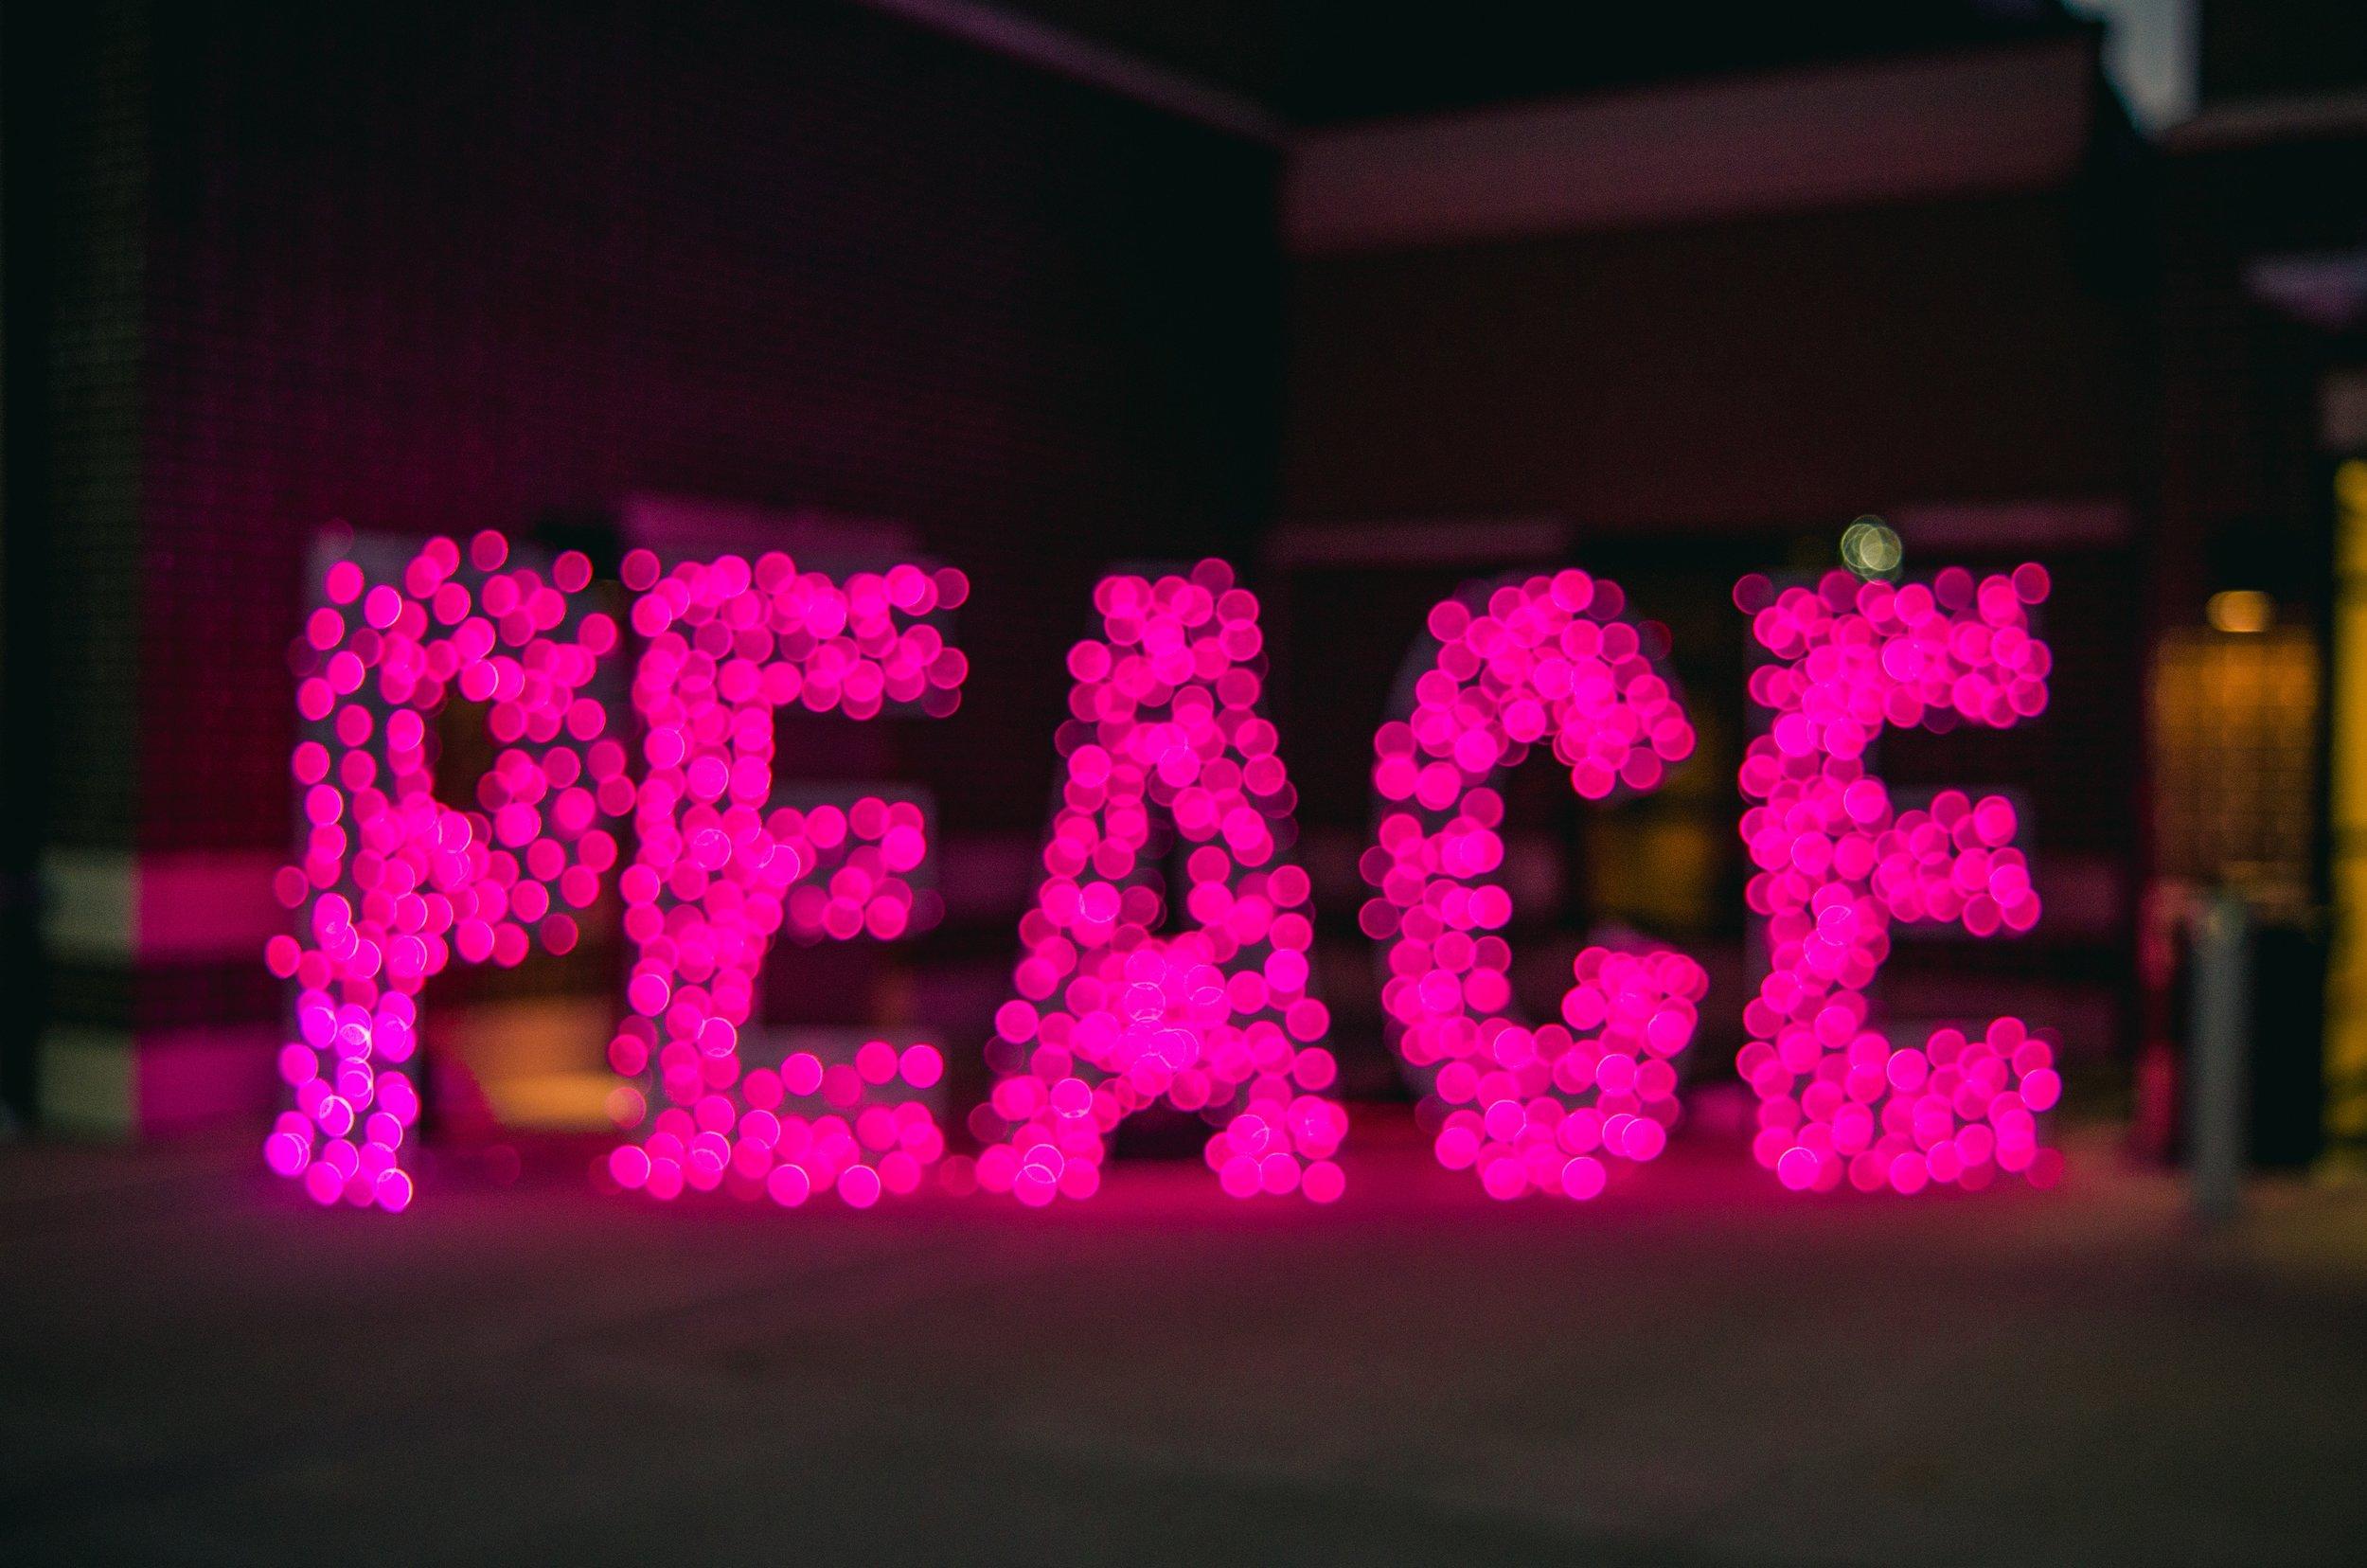 PEACE jonathan-meyer-489338-unsplash.jpg